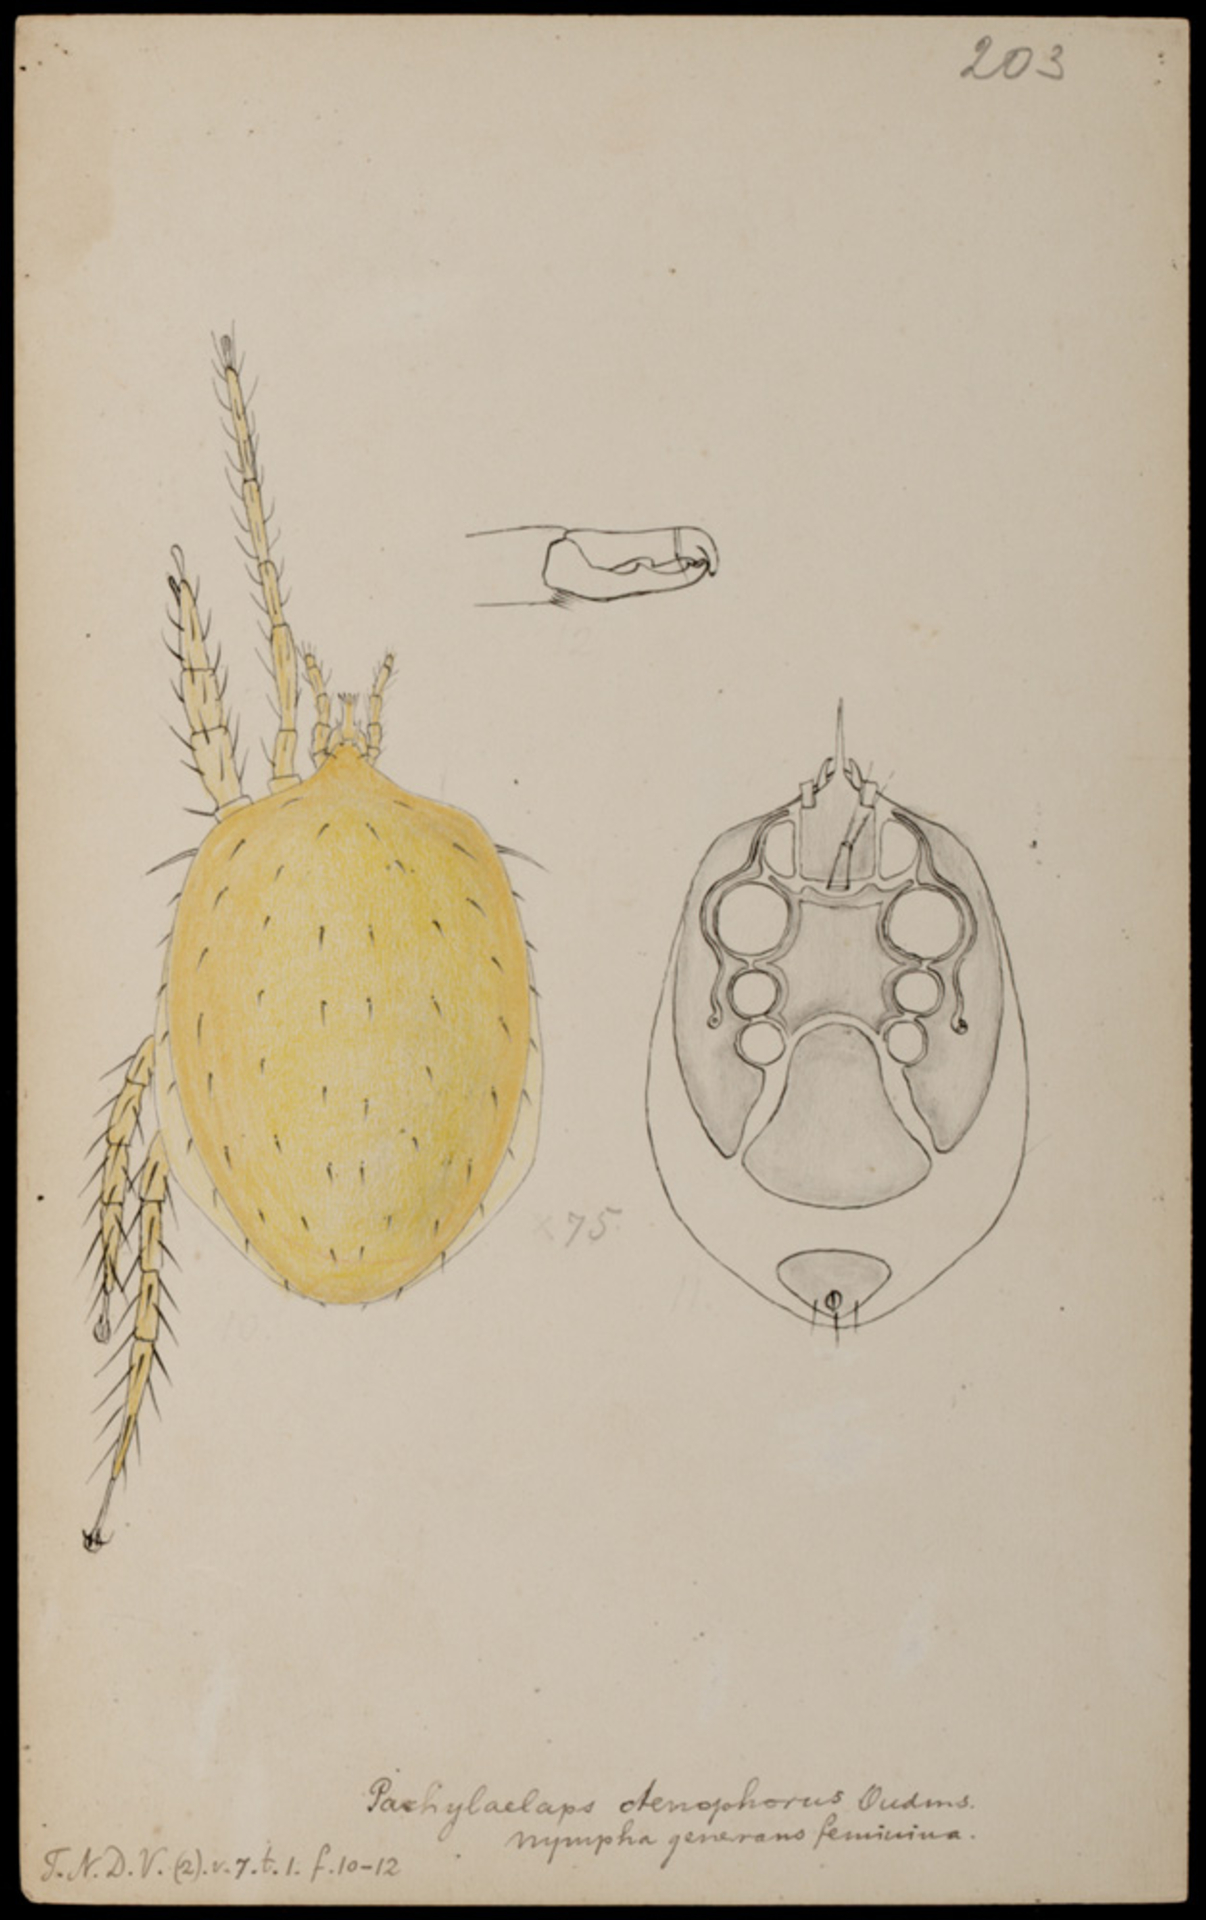 RMNH.ART.1049 | Pachylaelaps ctenophorus (Oudemans)